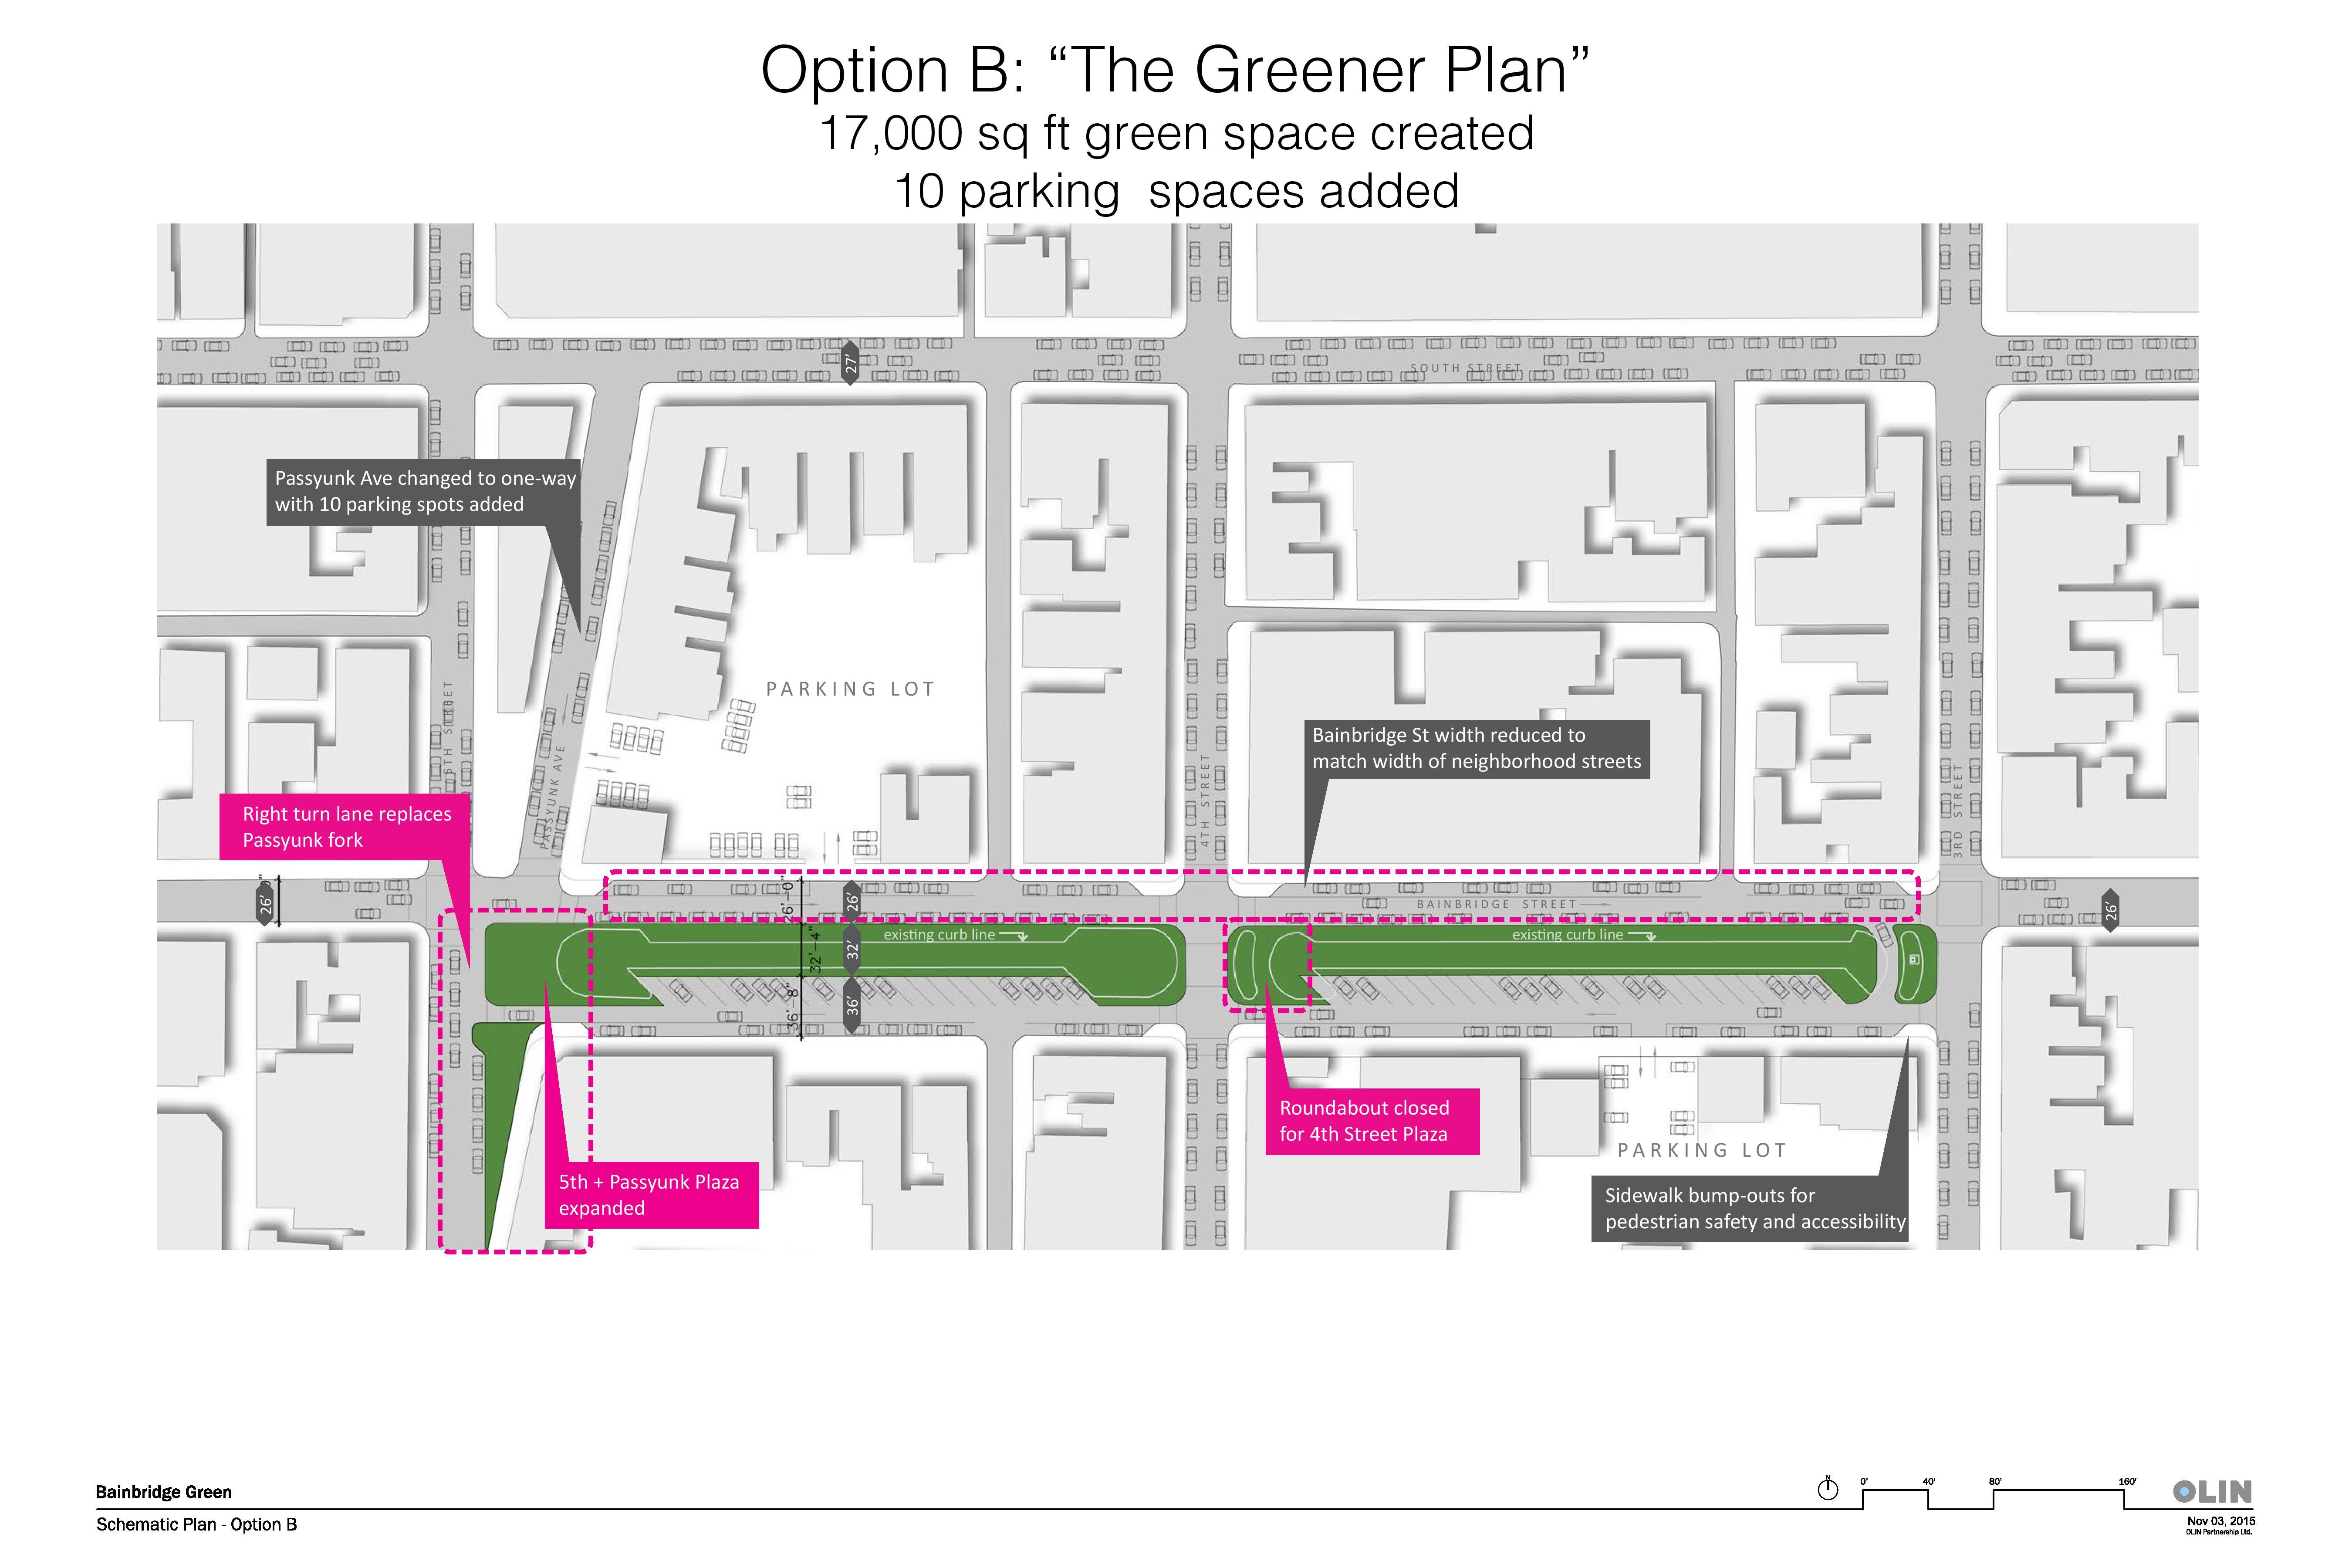 bainbridge-green-option-b